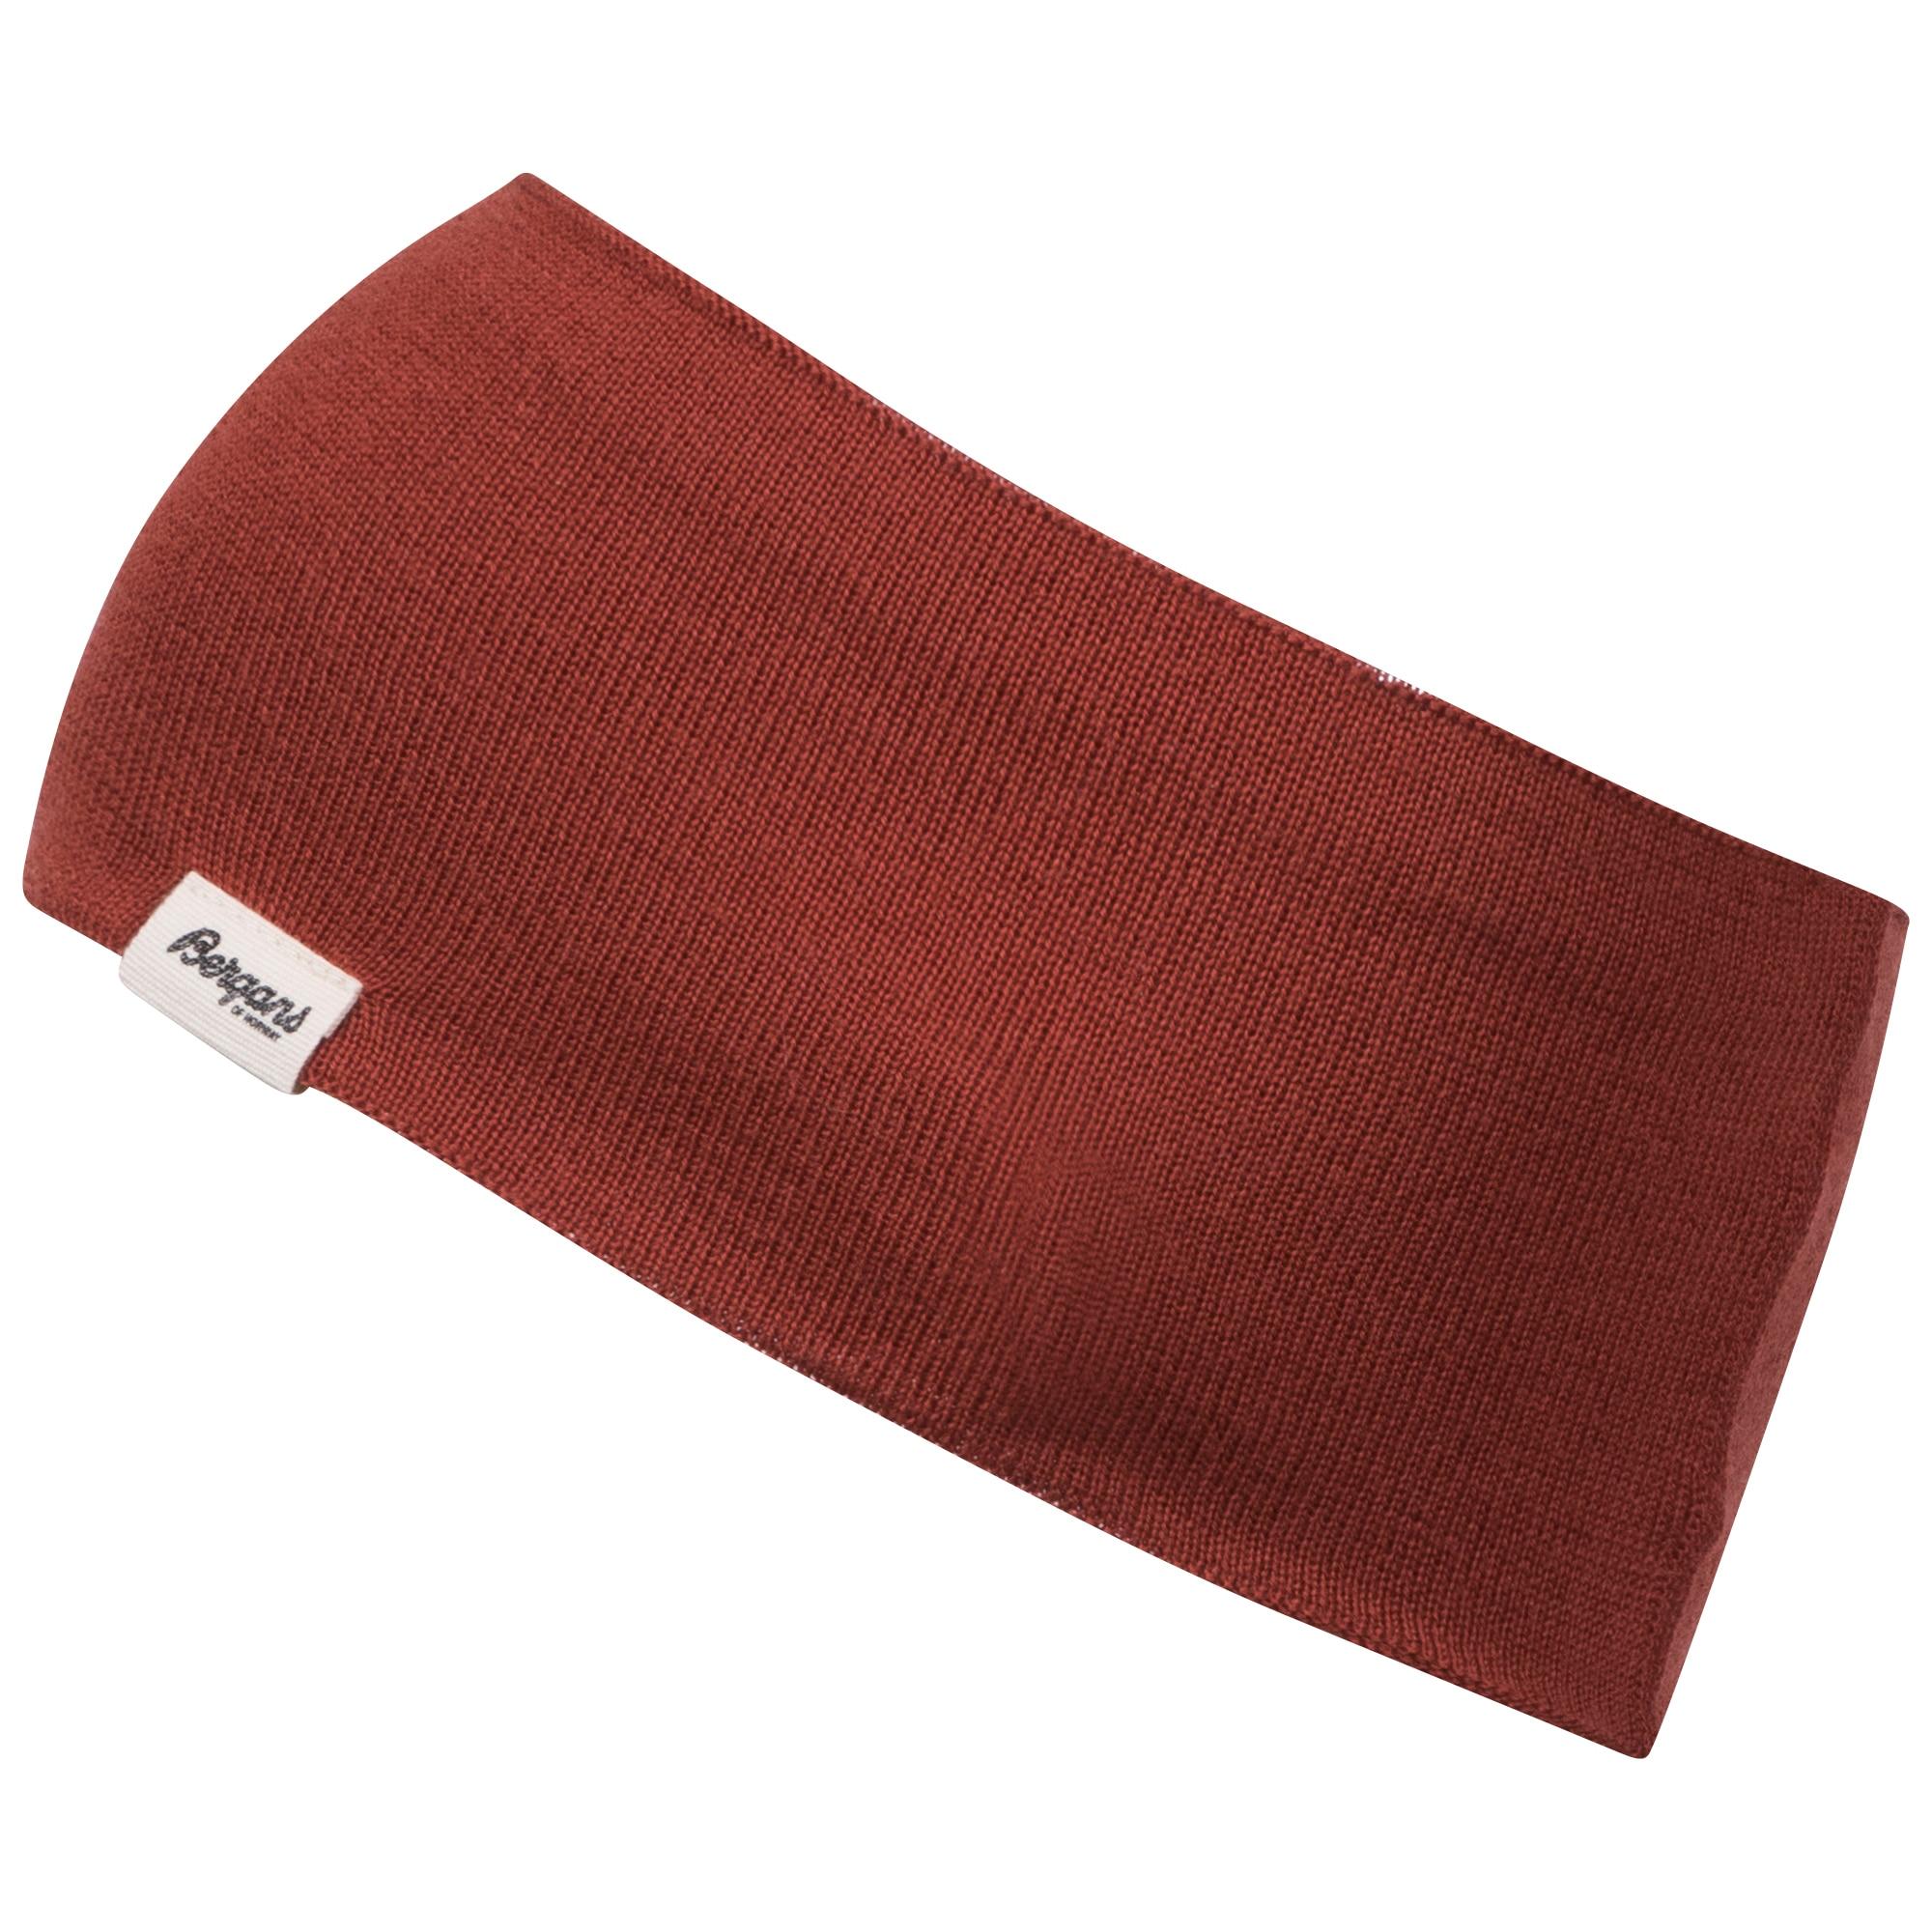 Slingsby Wool Headband